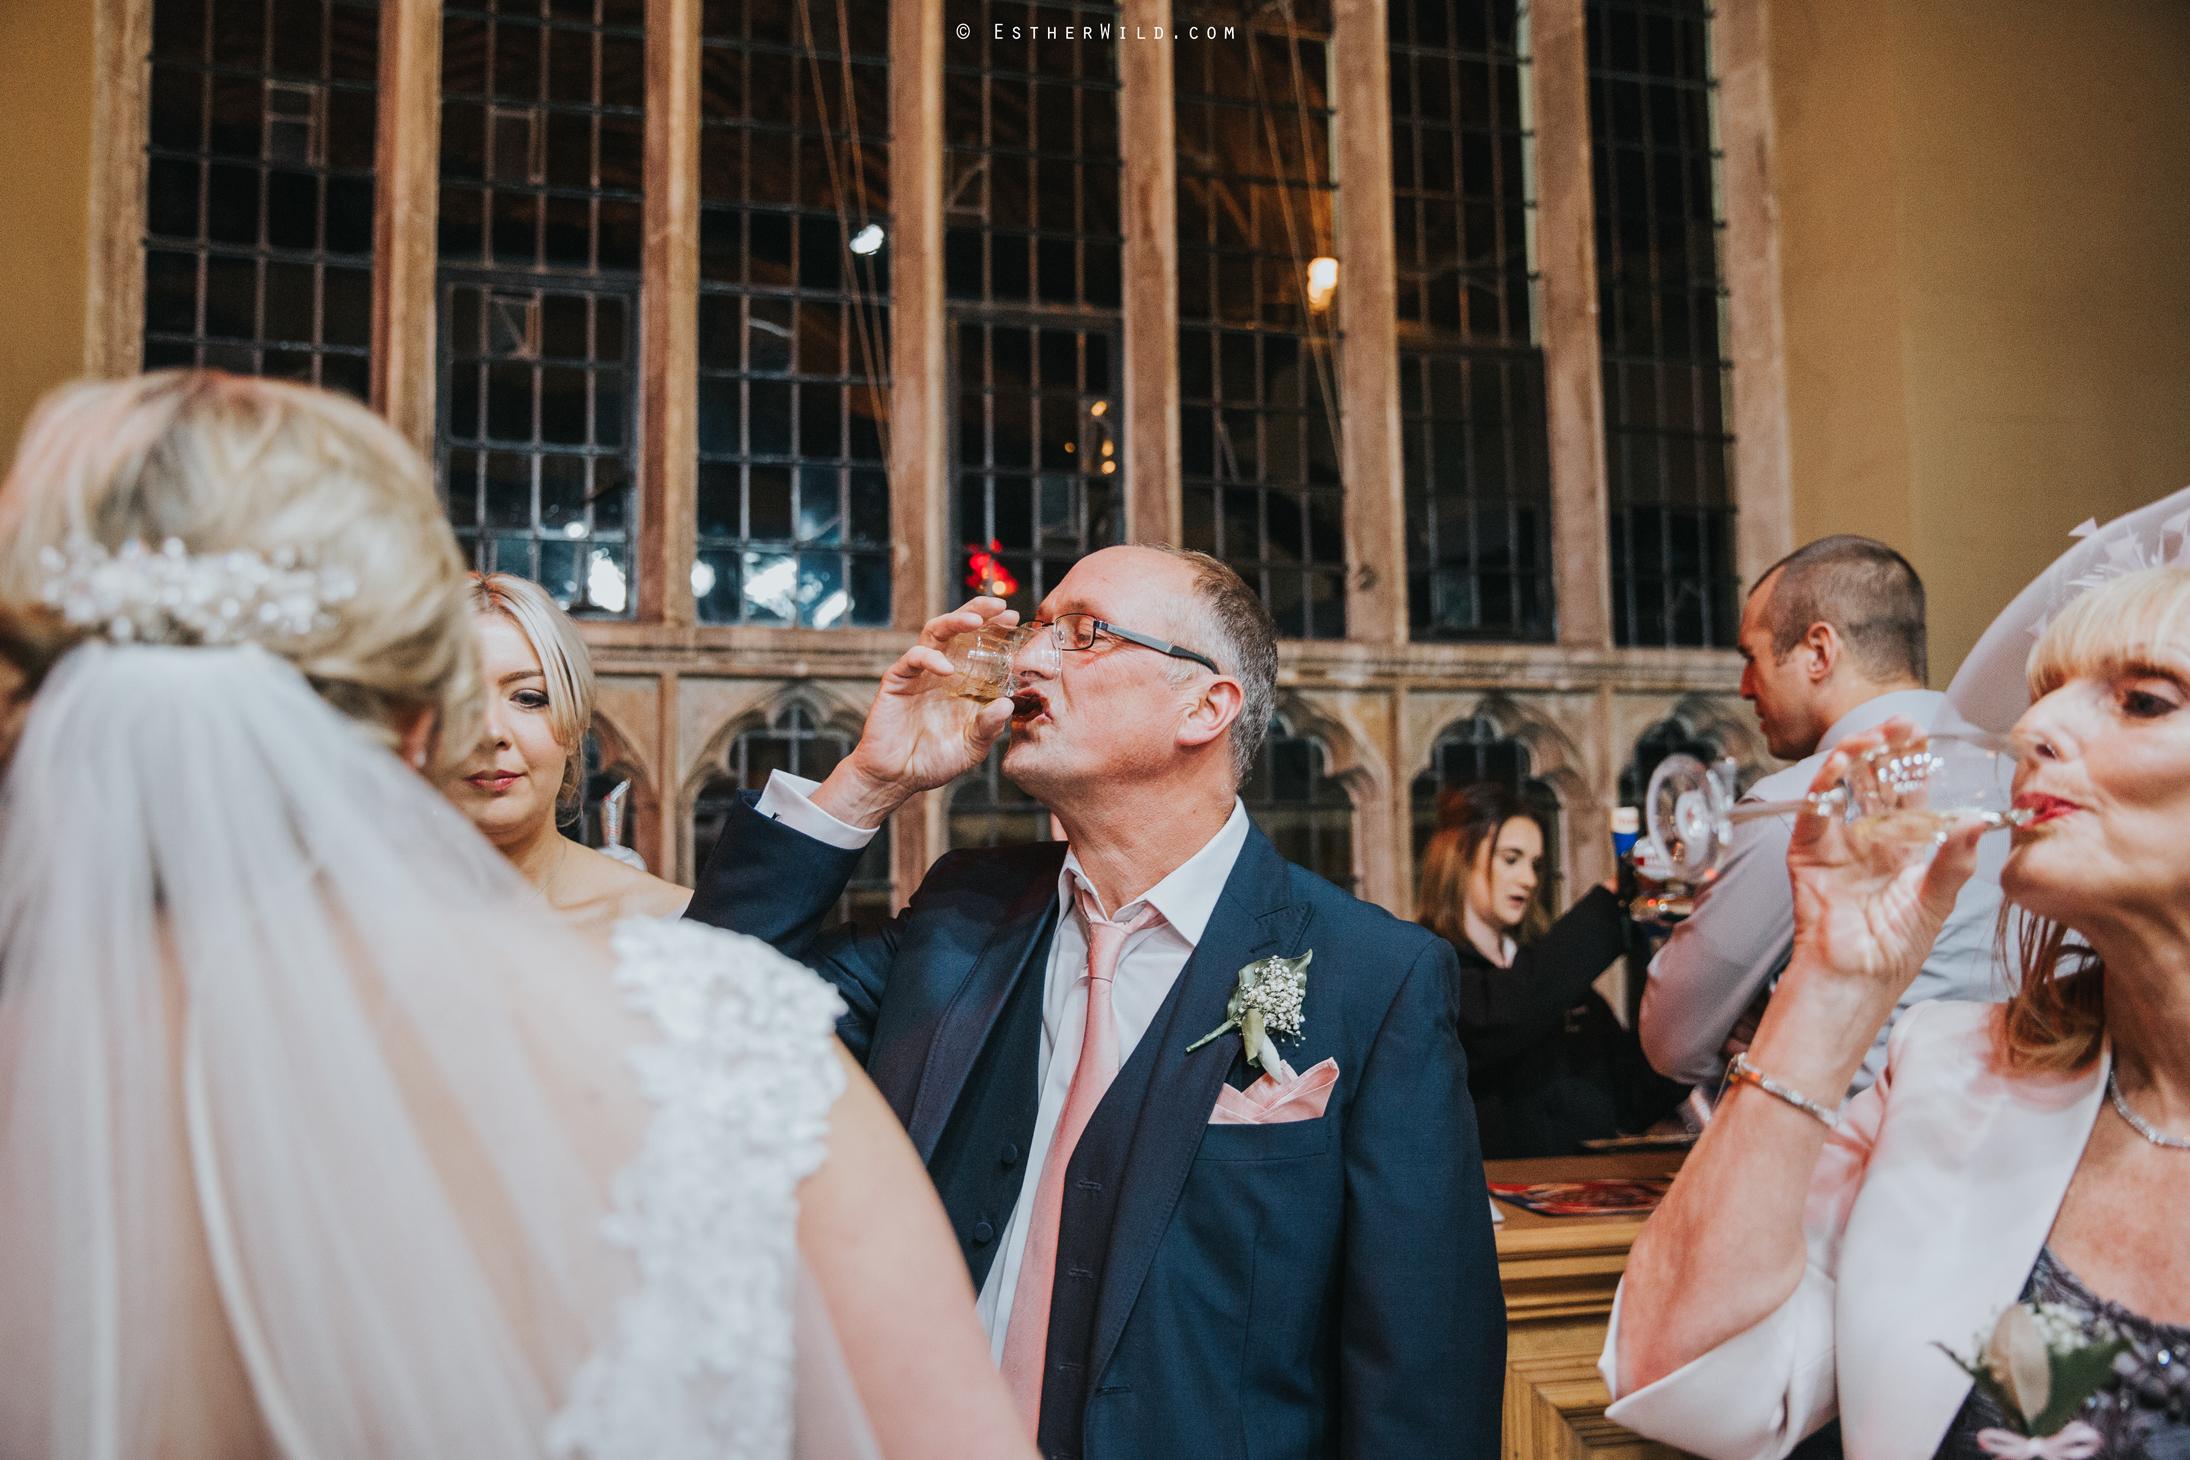 Wedding_Kings_Lynn_Town_Hall_Norfolk_Photographer_Esther_Wild_IMG_1802_IMGL0607.jpg